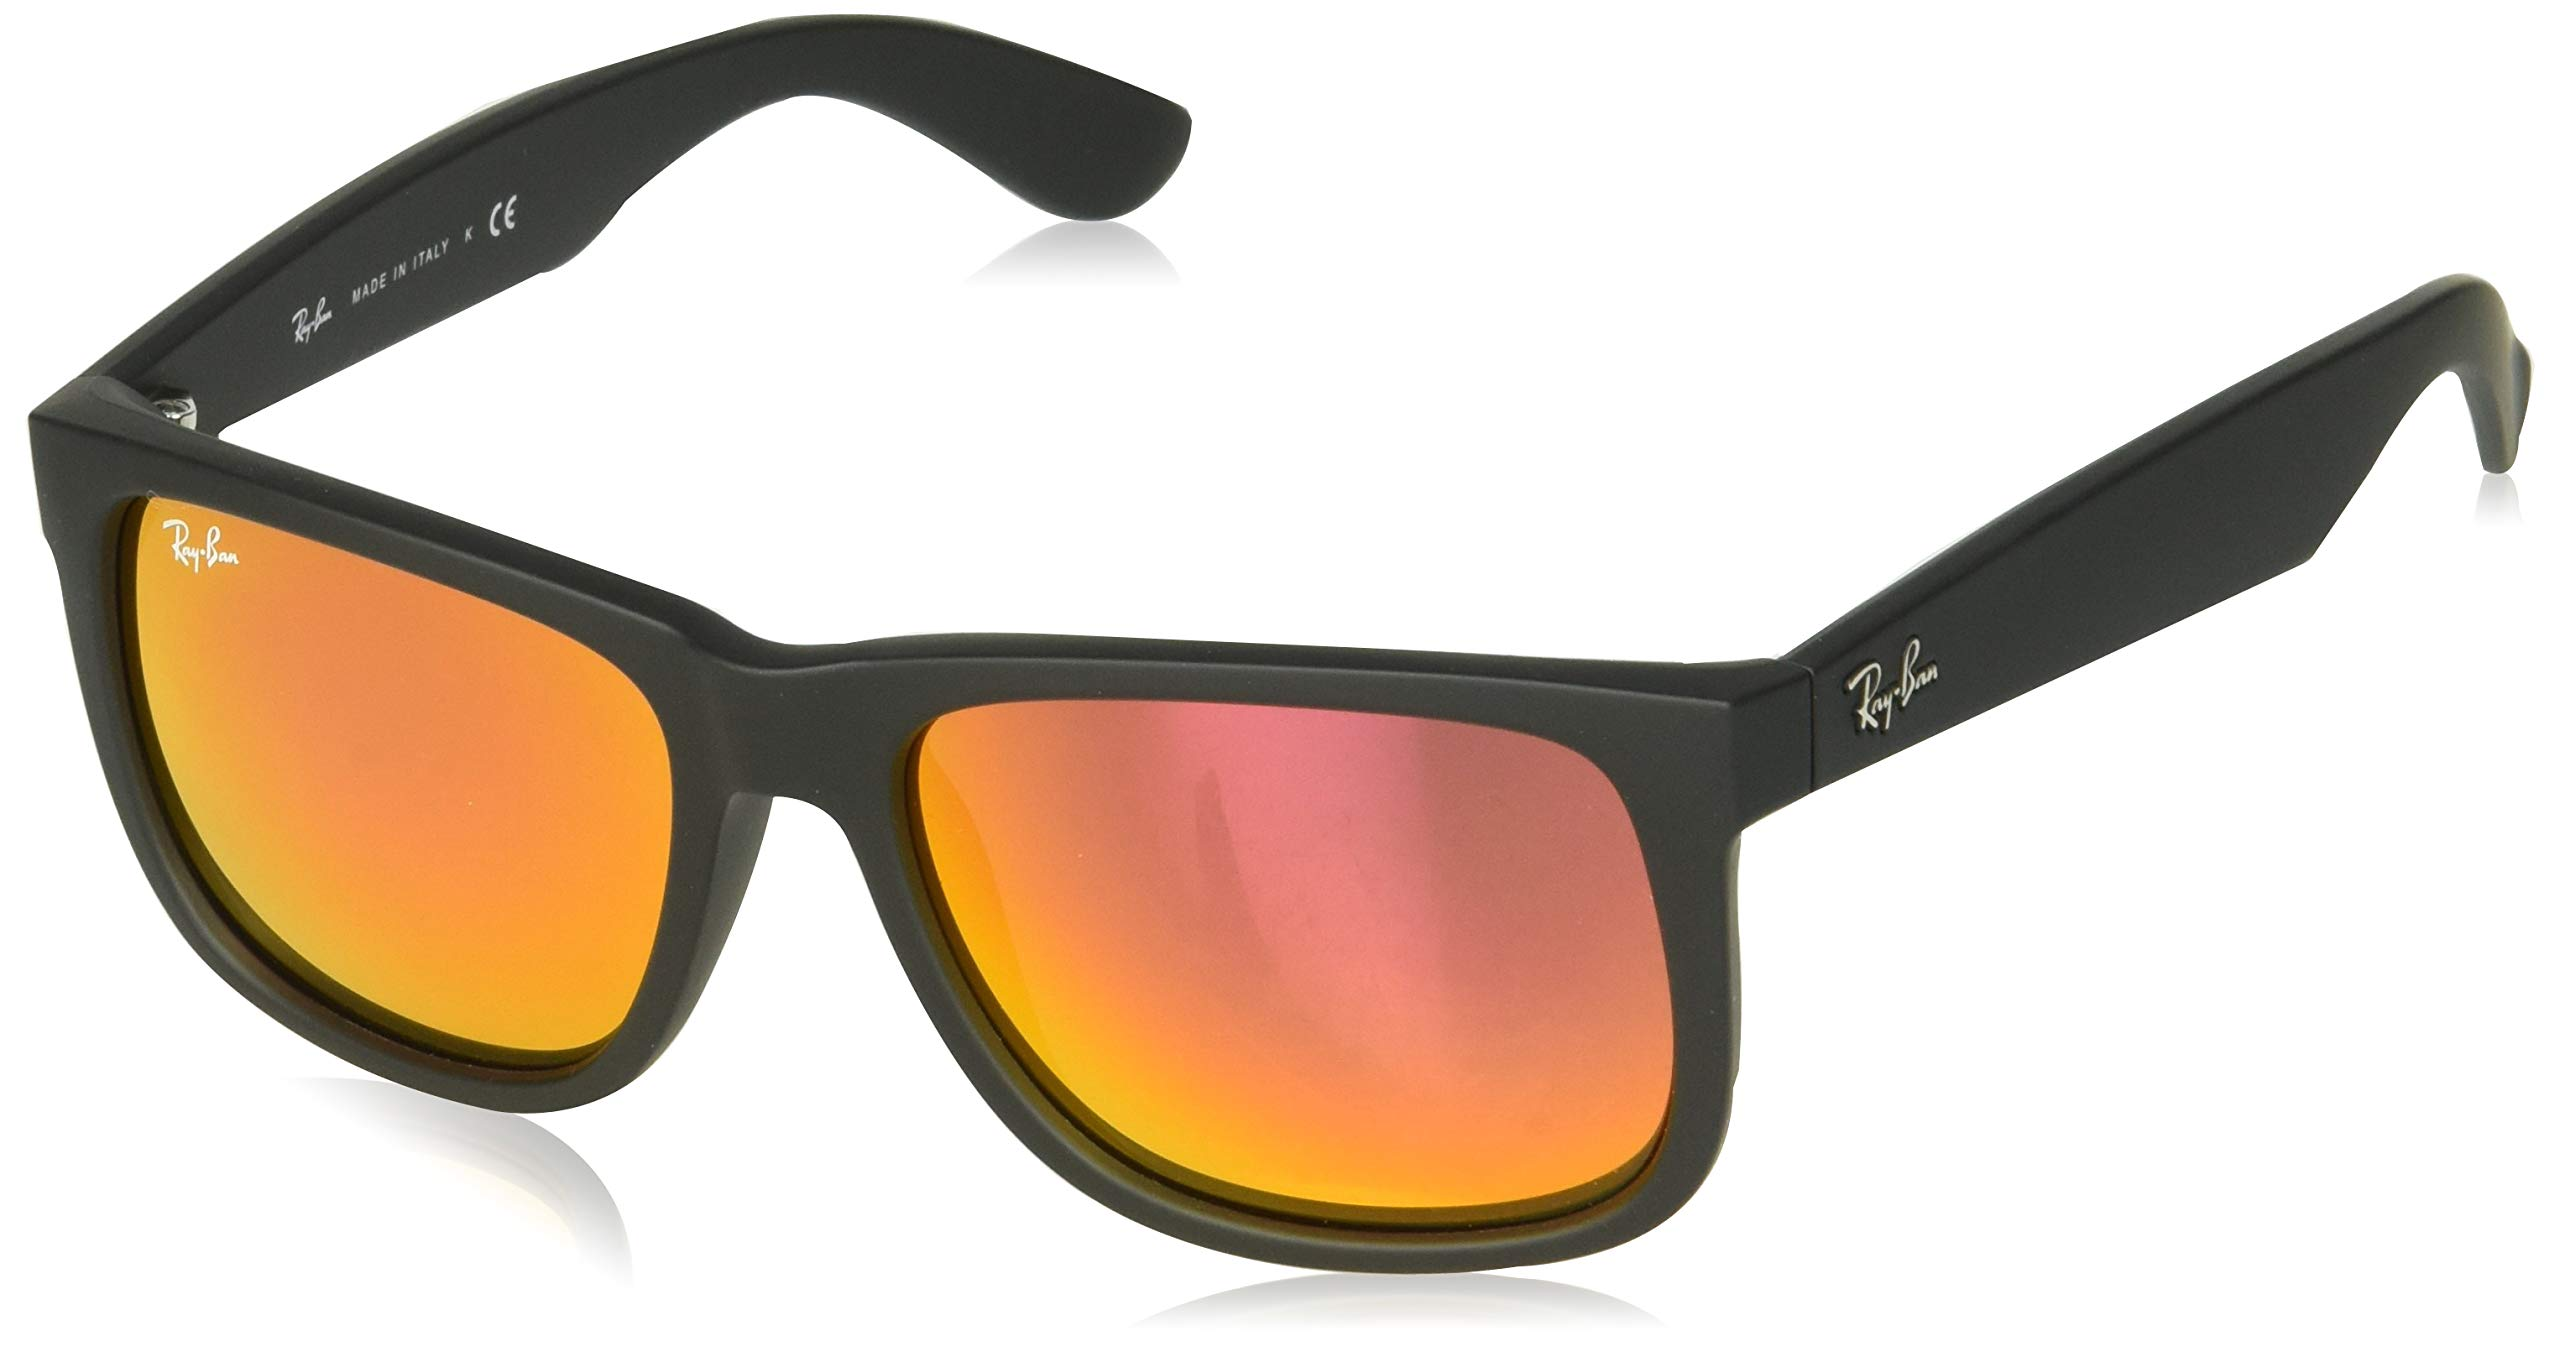 RAY-BAN RB4165 Justin Rectangular Sunglasses, Black Rubber/Orange Mirror, 55 mm by RAY-BAN